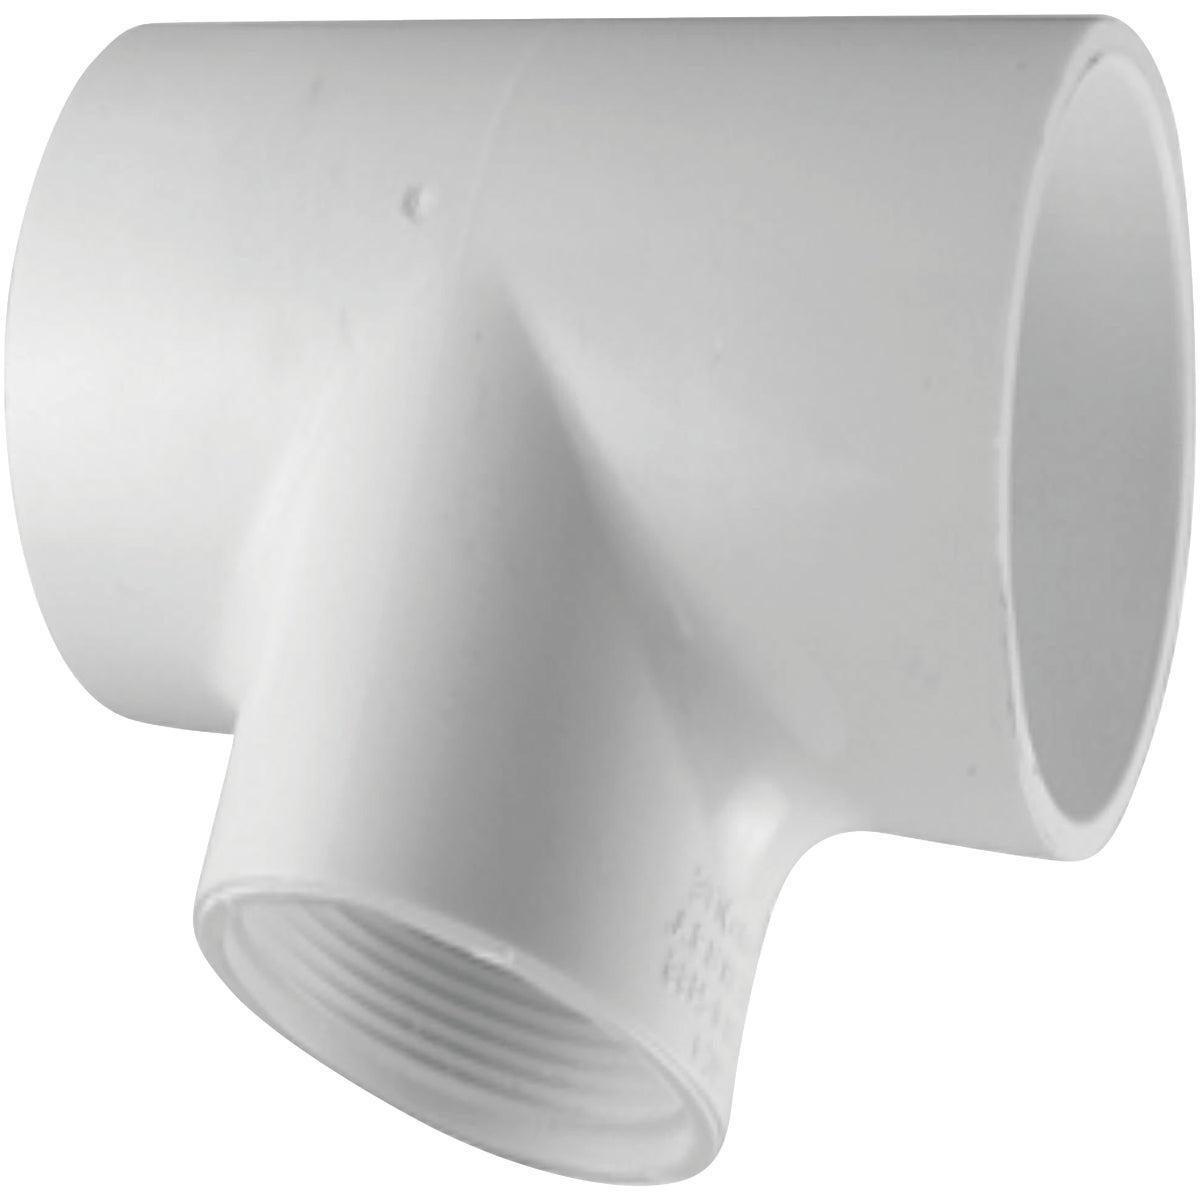 "1/2"" SCH40 PVC SXFIP TEE - 31455 by Genova Inc"